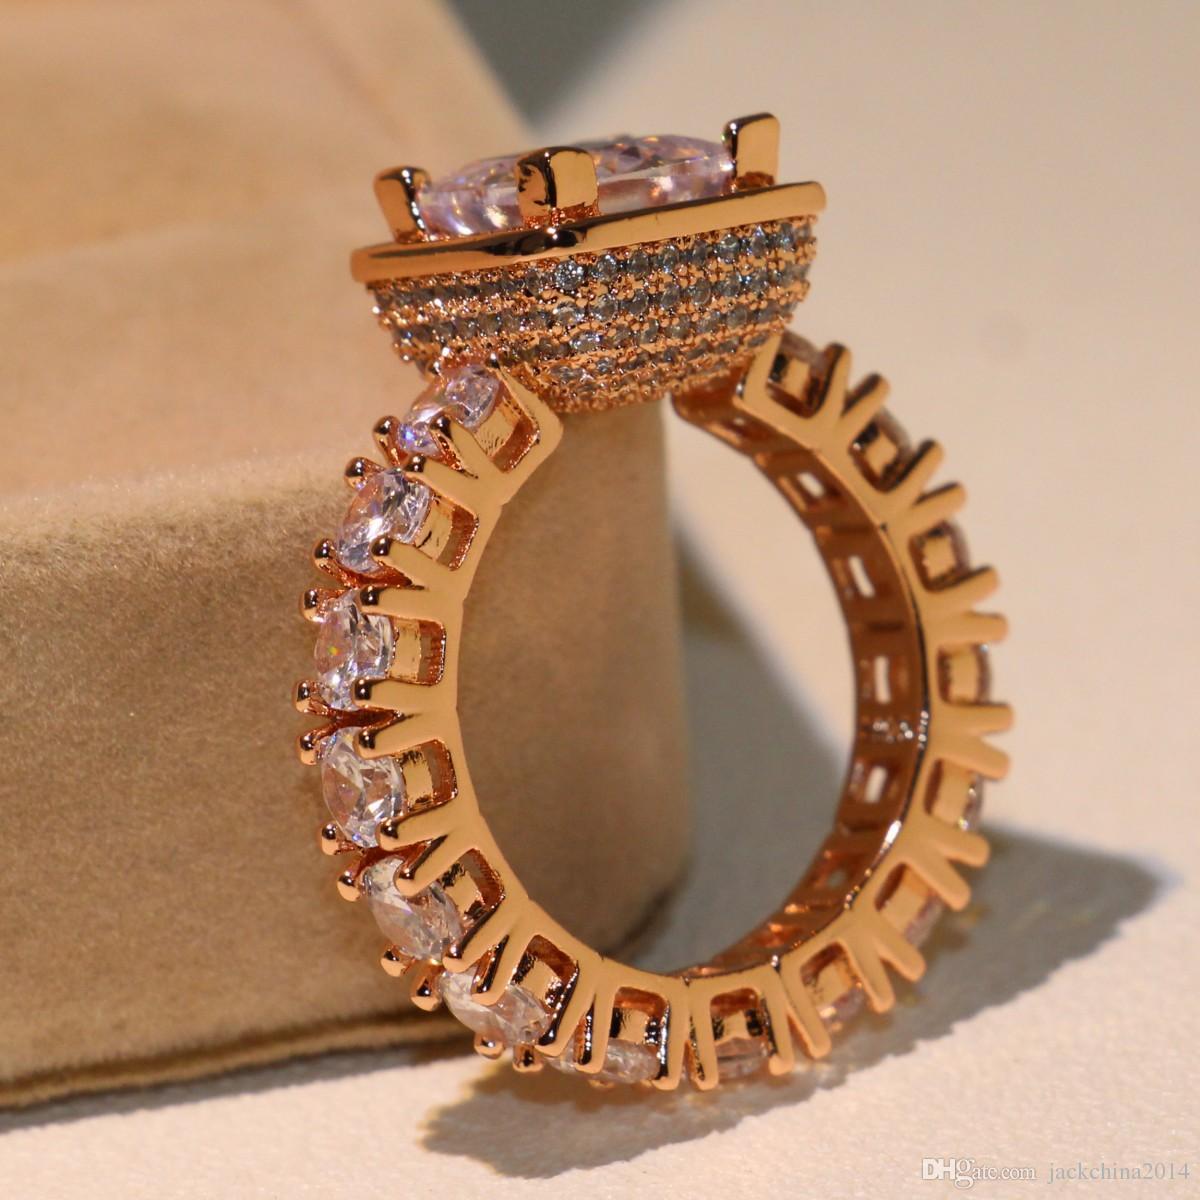 Sparkling Luxury Jewelry Brand Desgin Choucong 925 Sterling Silver&Rose Gold Filled Princess Cut Topaz CZ Diamond Women Wedding Band Ring